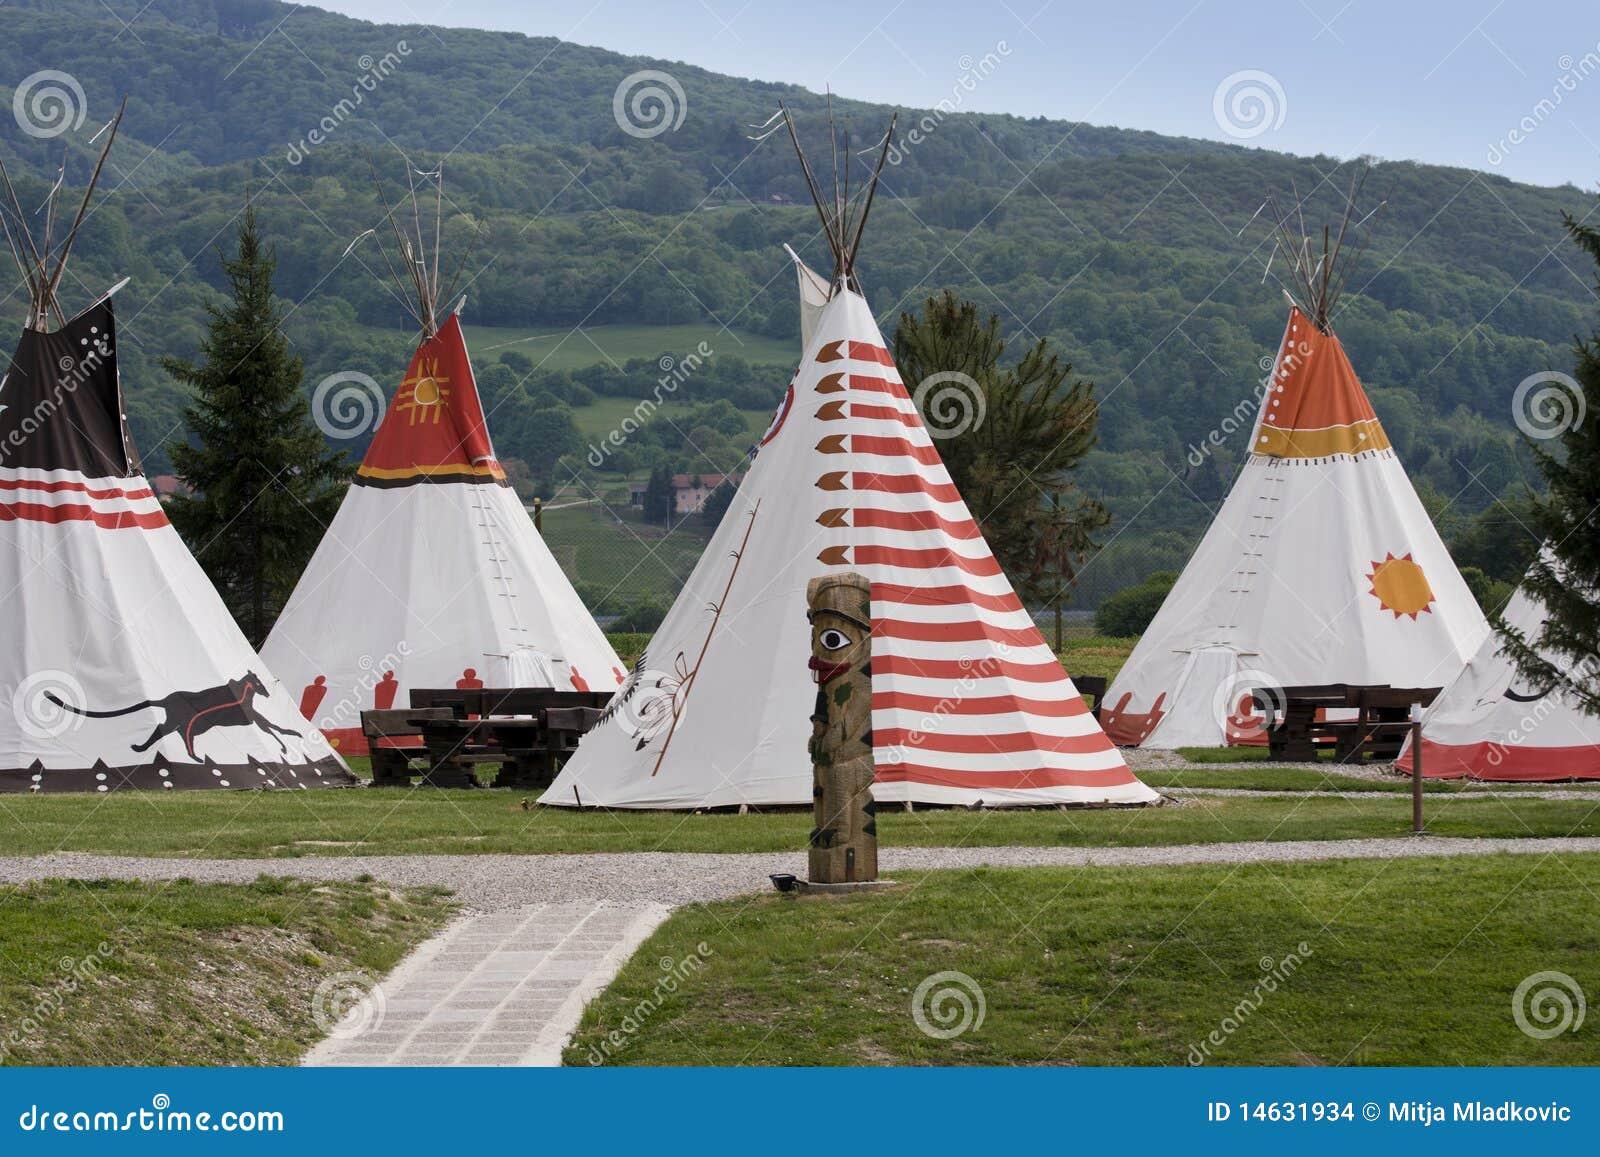 Native Americans village